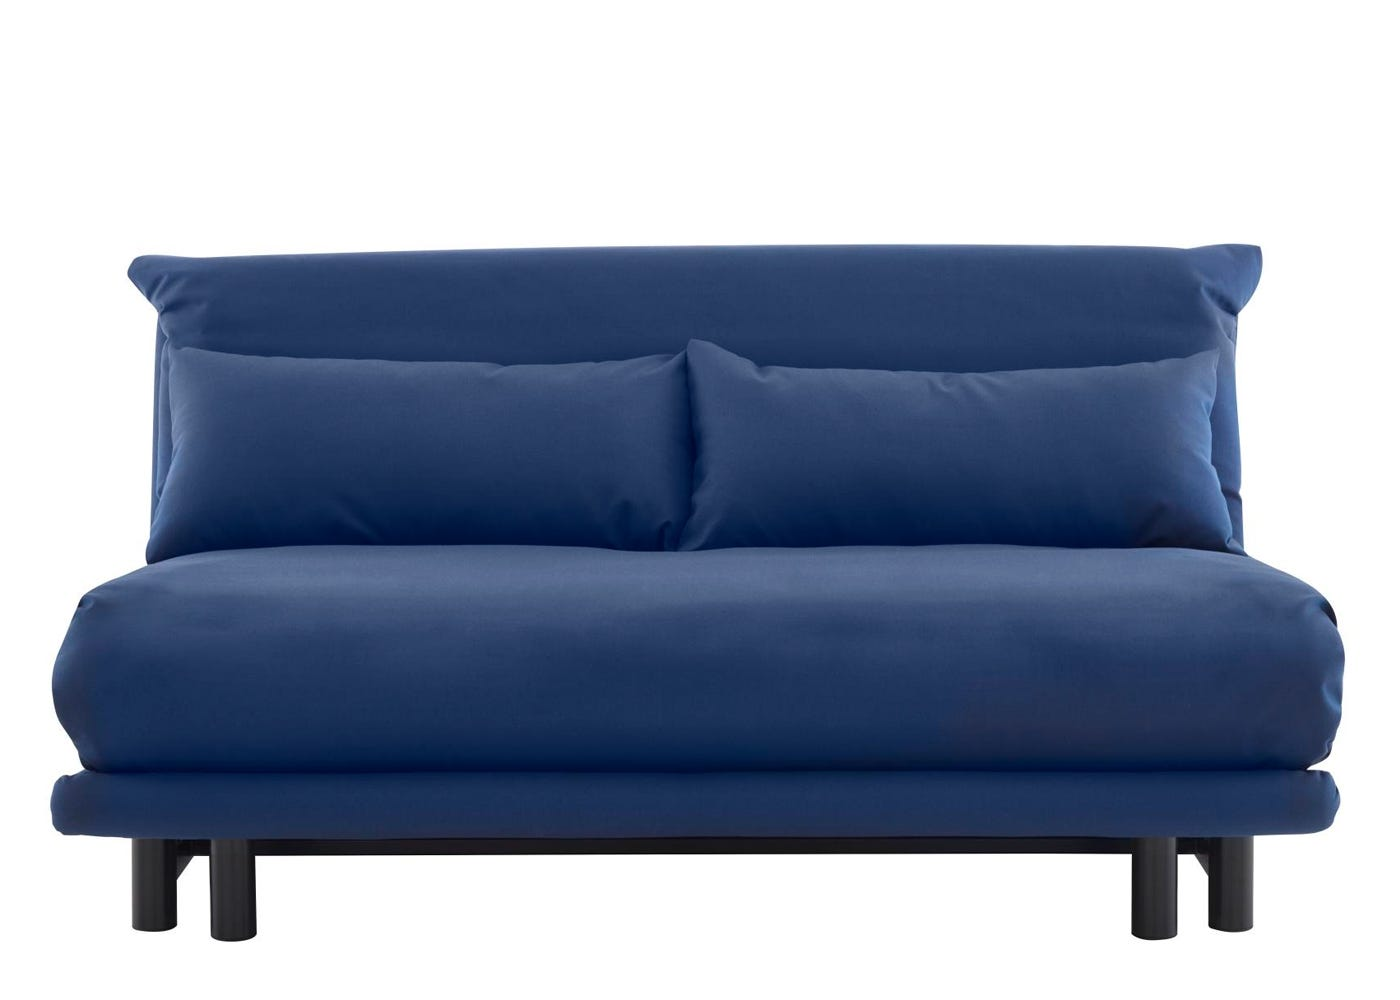 Multy Premier Sofa Bed Revive 774 Blue